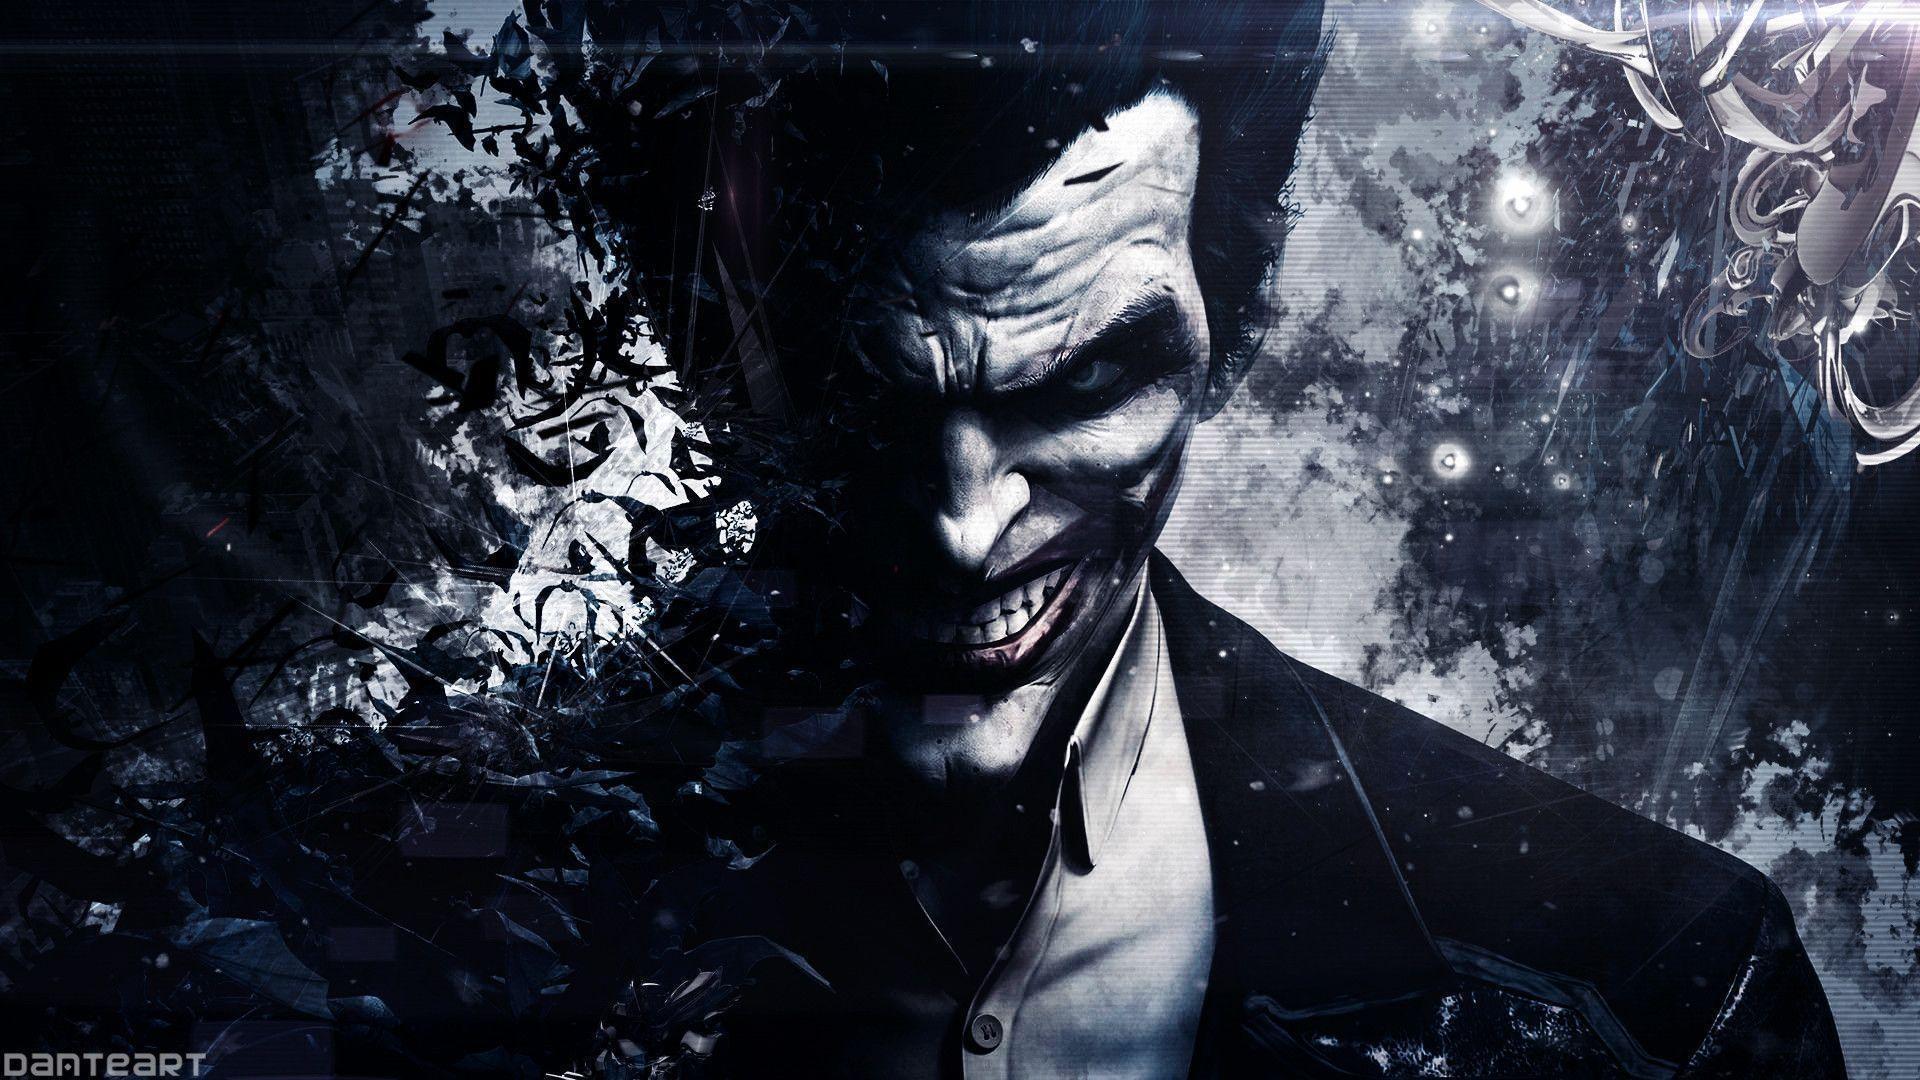 Batman Joker Wallpapers 70 Images